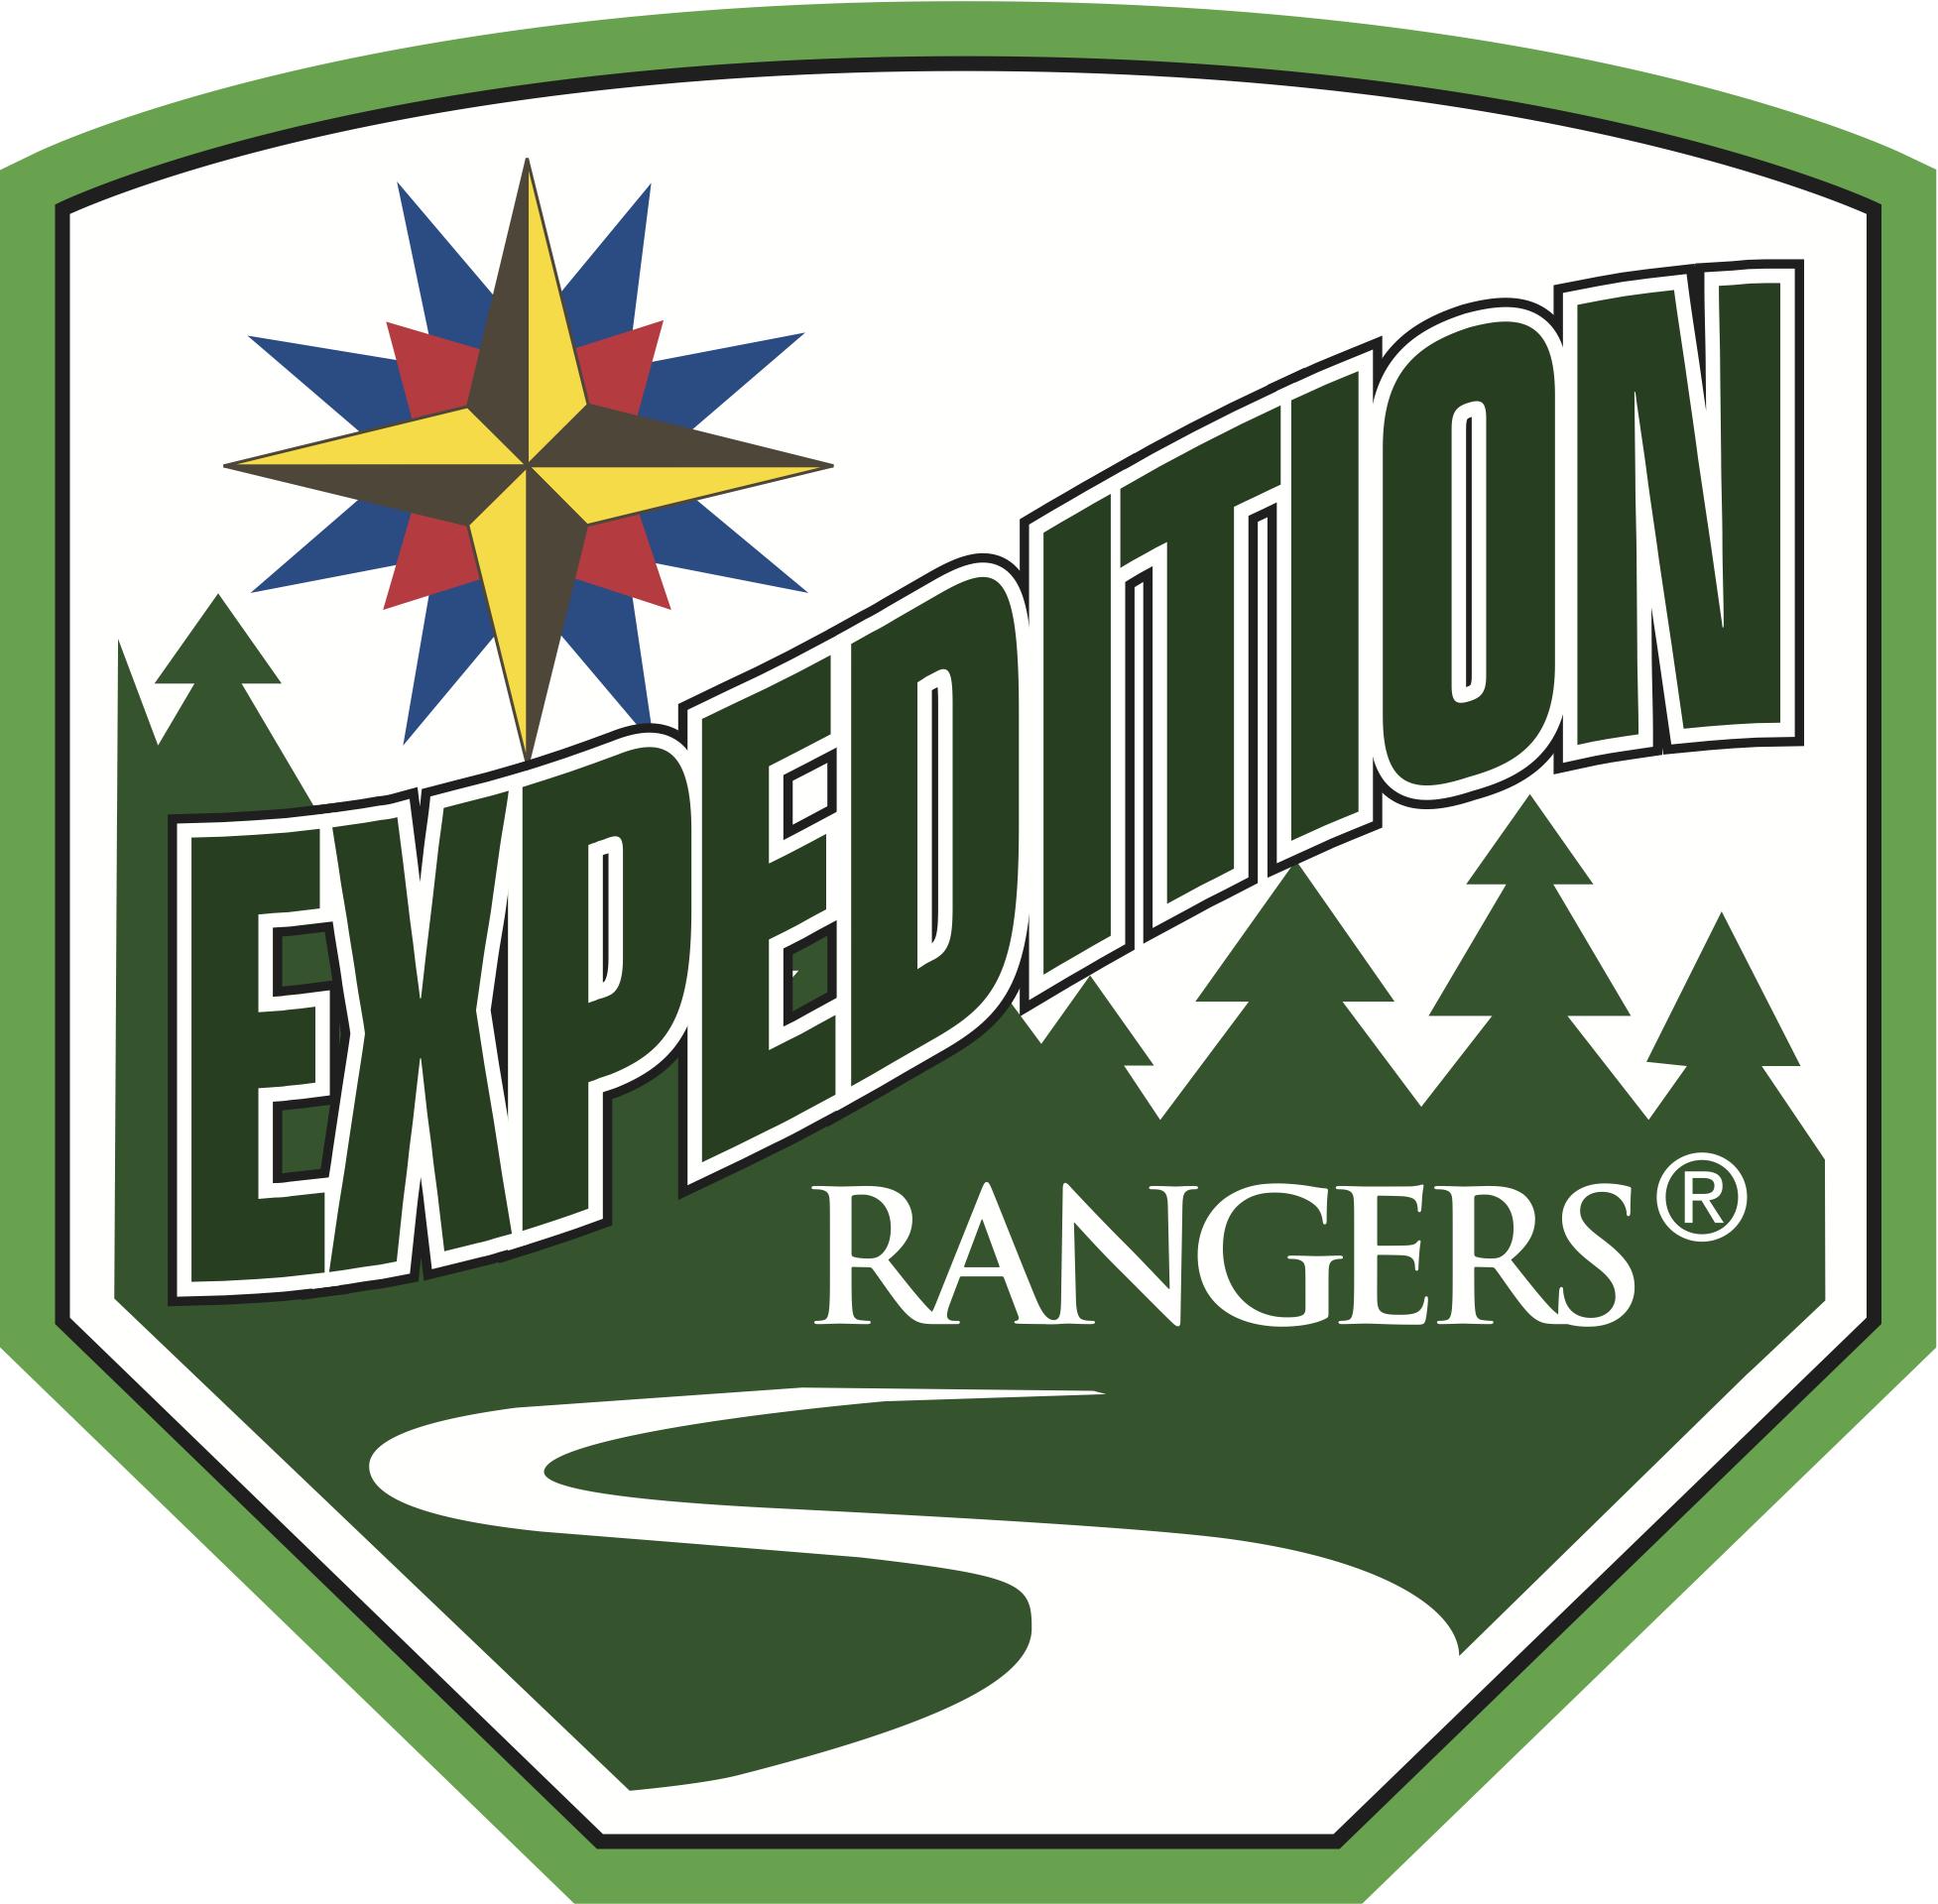 expedition rangers copy.jpg